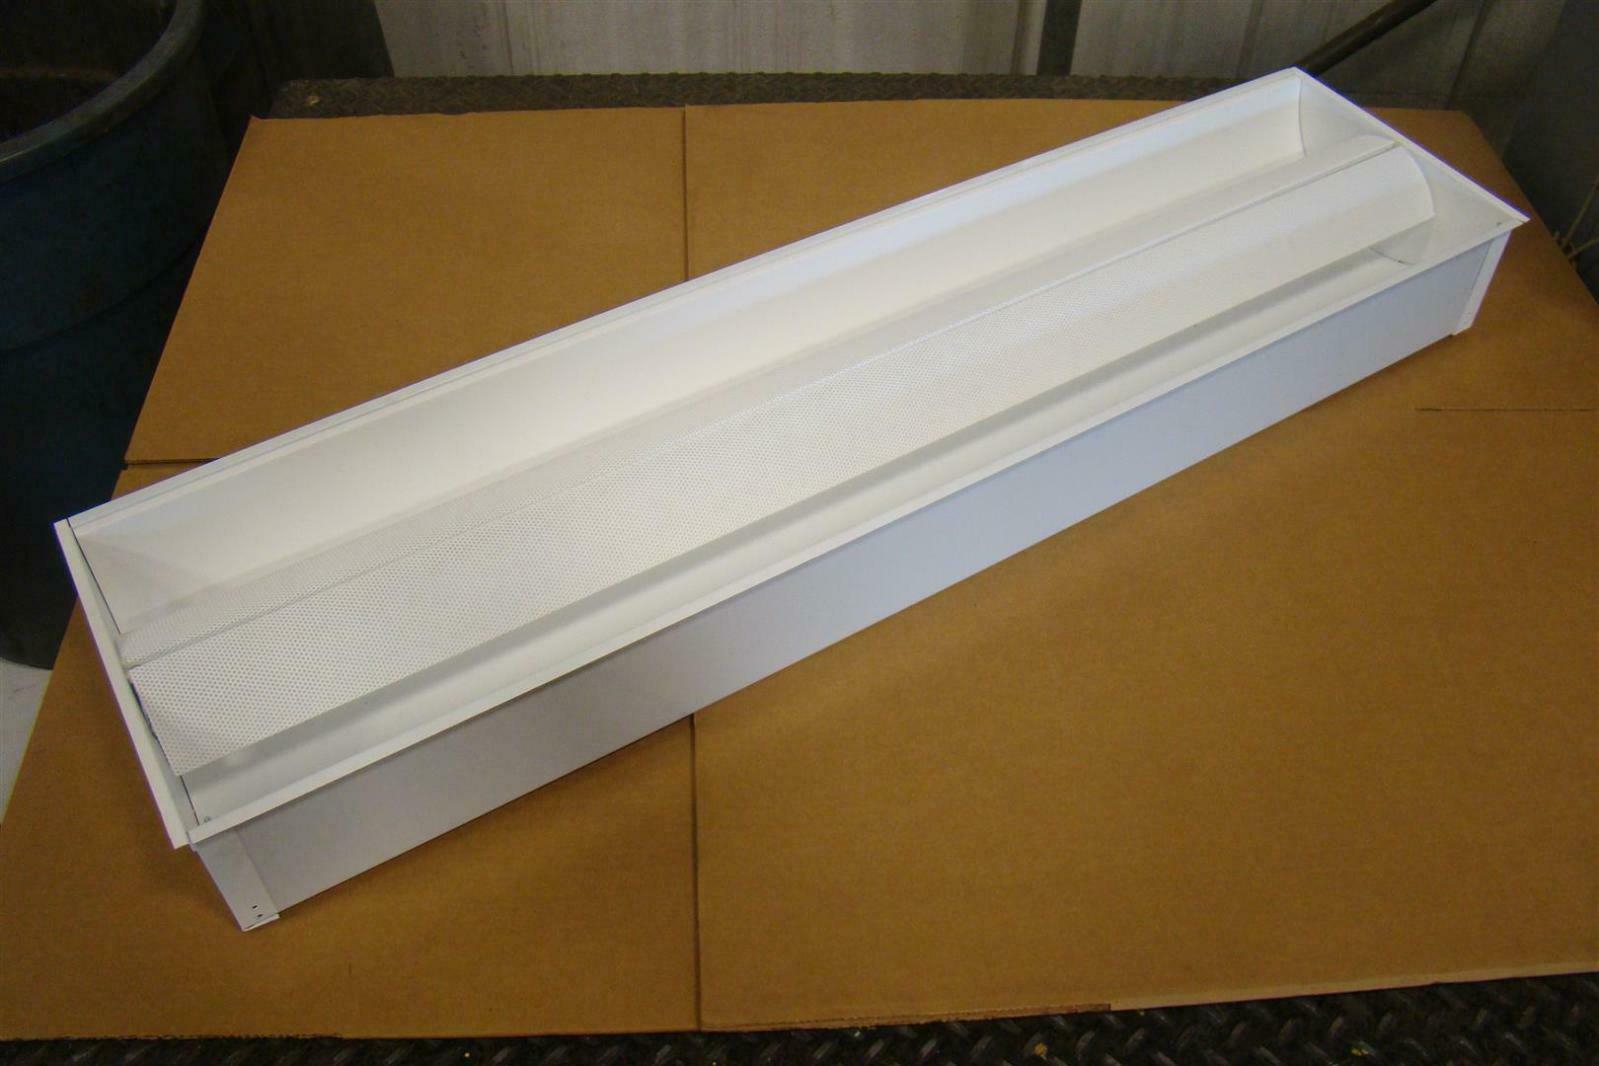 cfi fluorescent t8 light fixture 4 39 277v qvs1gpf0s232277s0 joseph. Black Bedroom Furniture Sets. Home Design Ideas